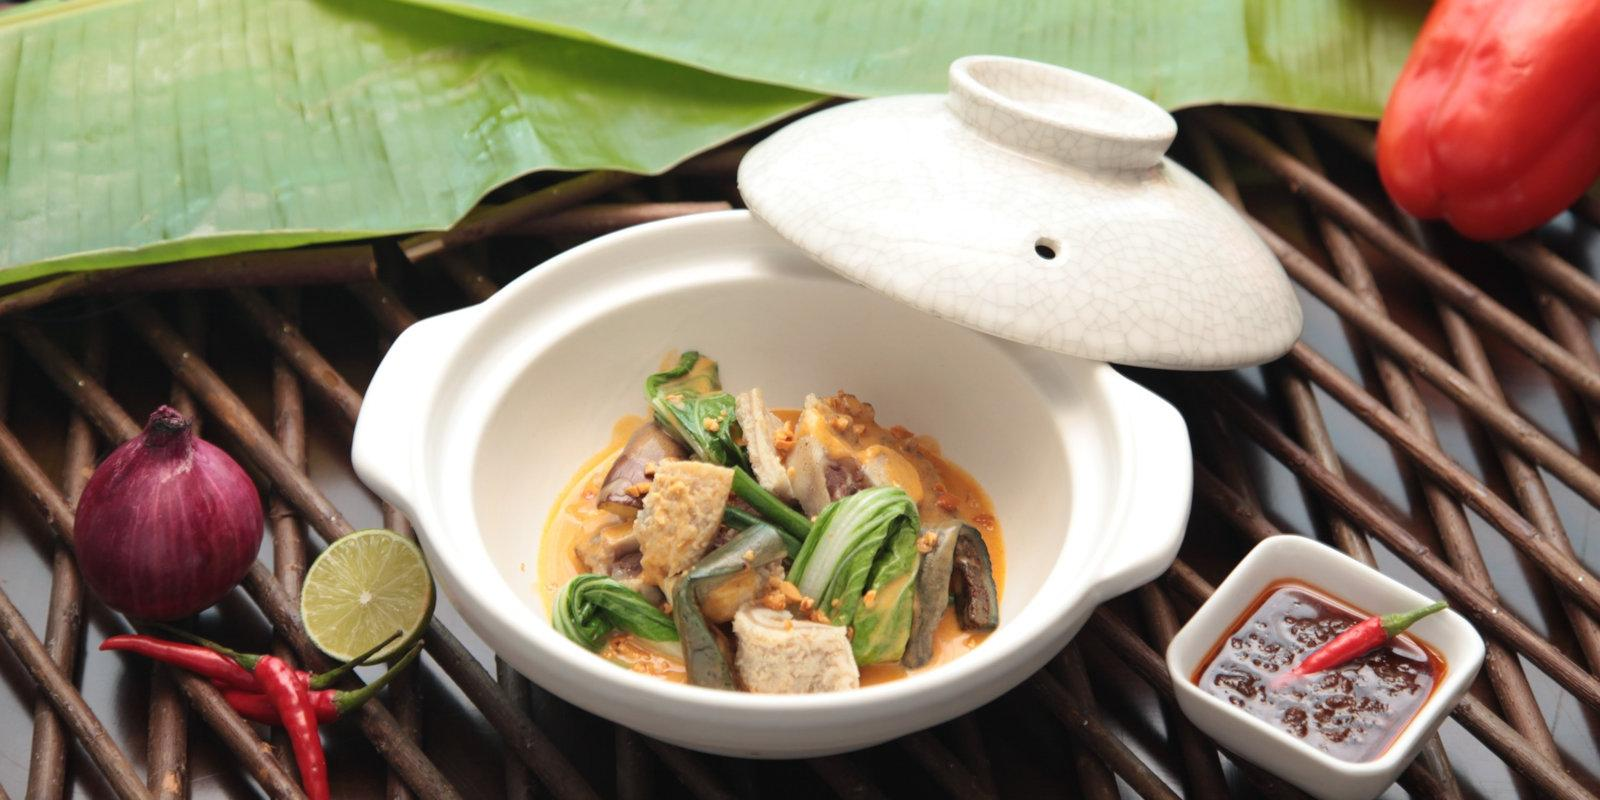 Kare kare é um delicioso tipo de guisado das Filipinas